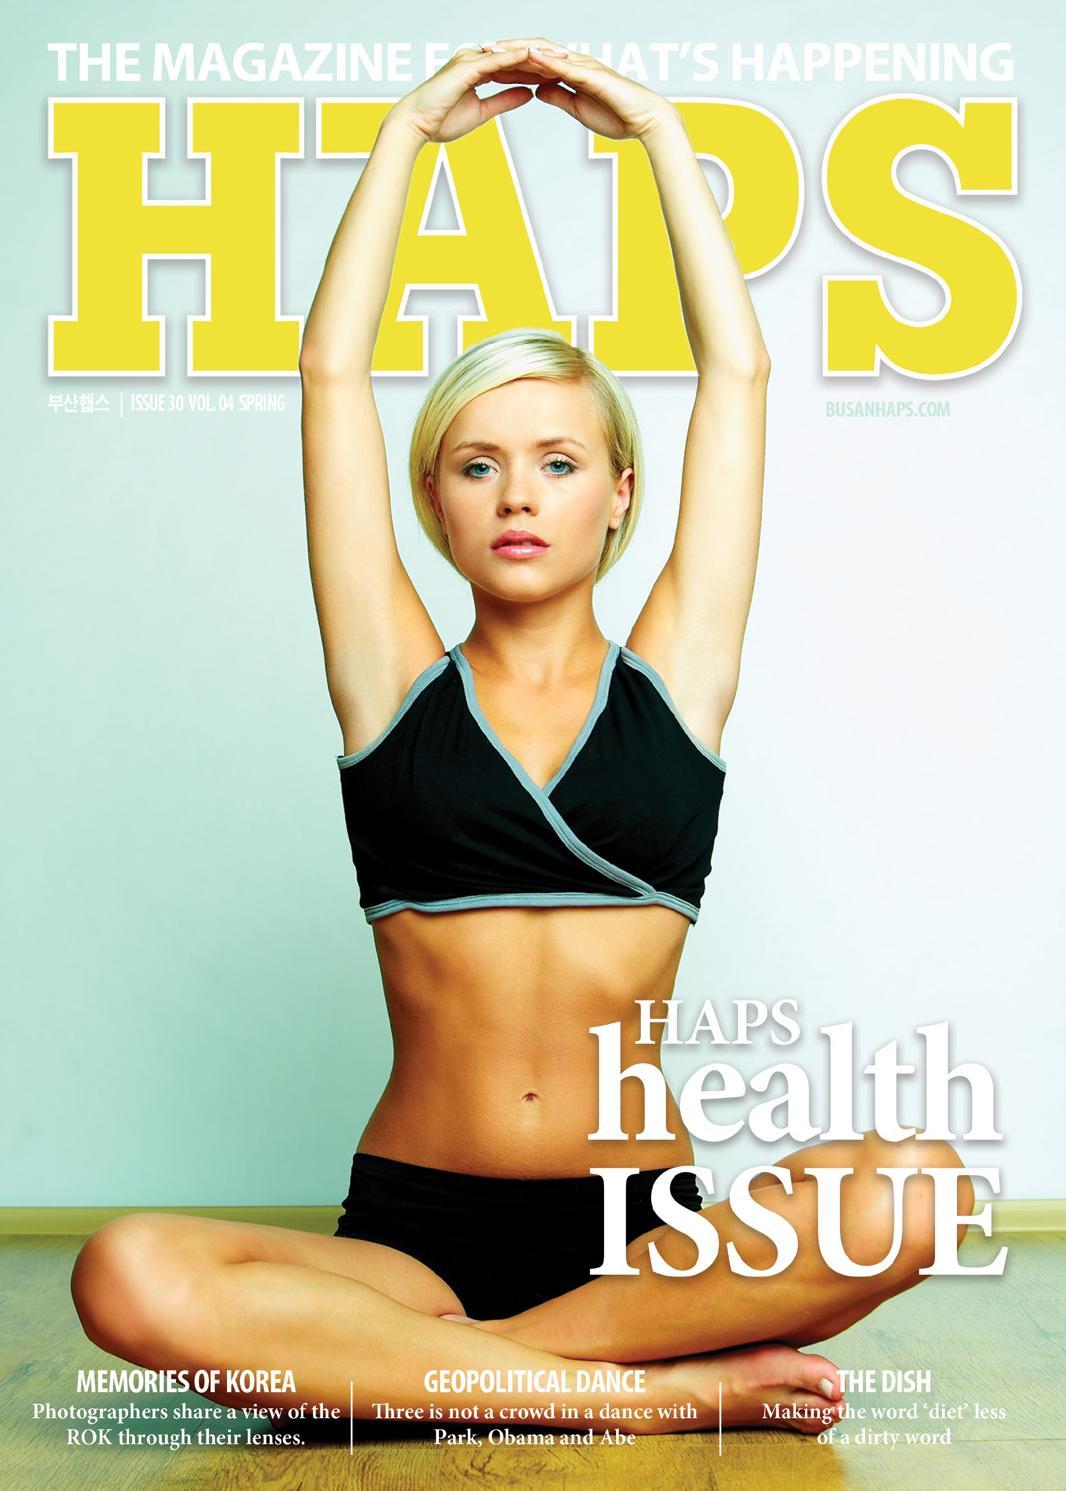 96de7525699c7 Busan Haps Issue 30 by Haps Magazine - issuu